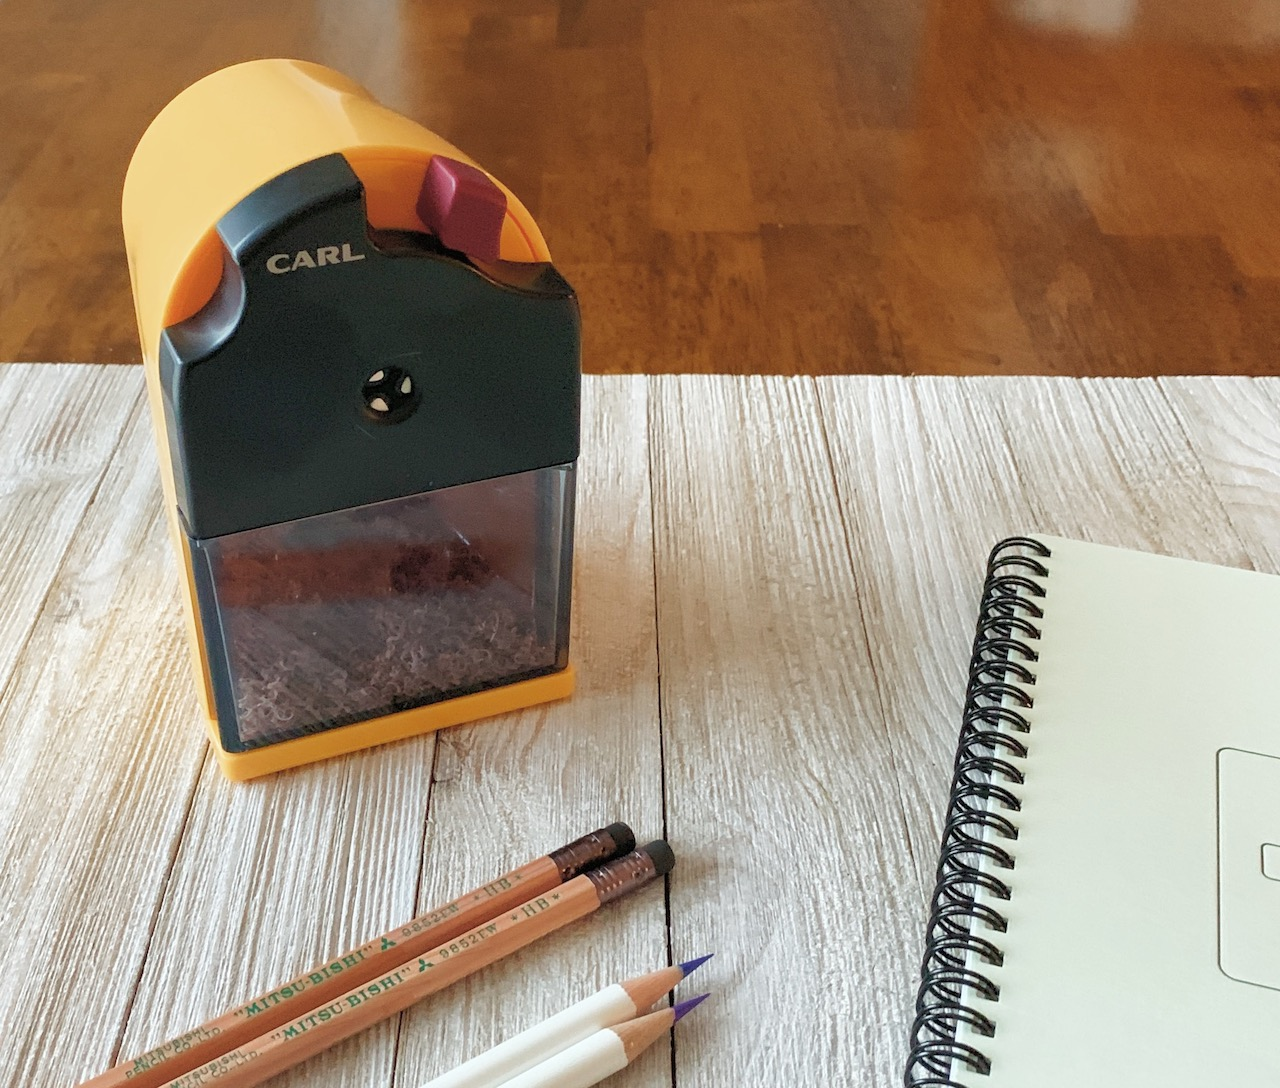 Carl Ein Pencil Sharpener Review